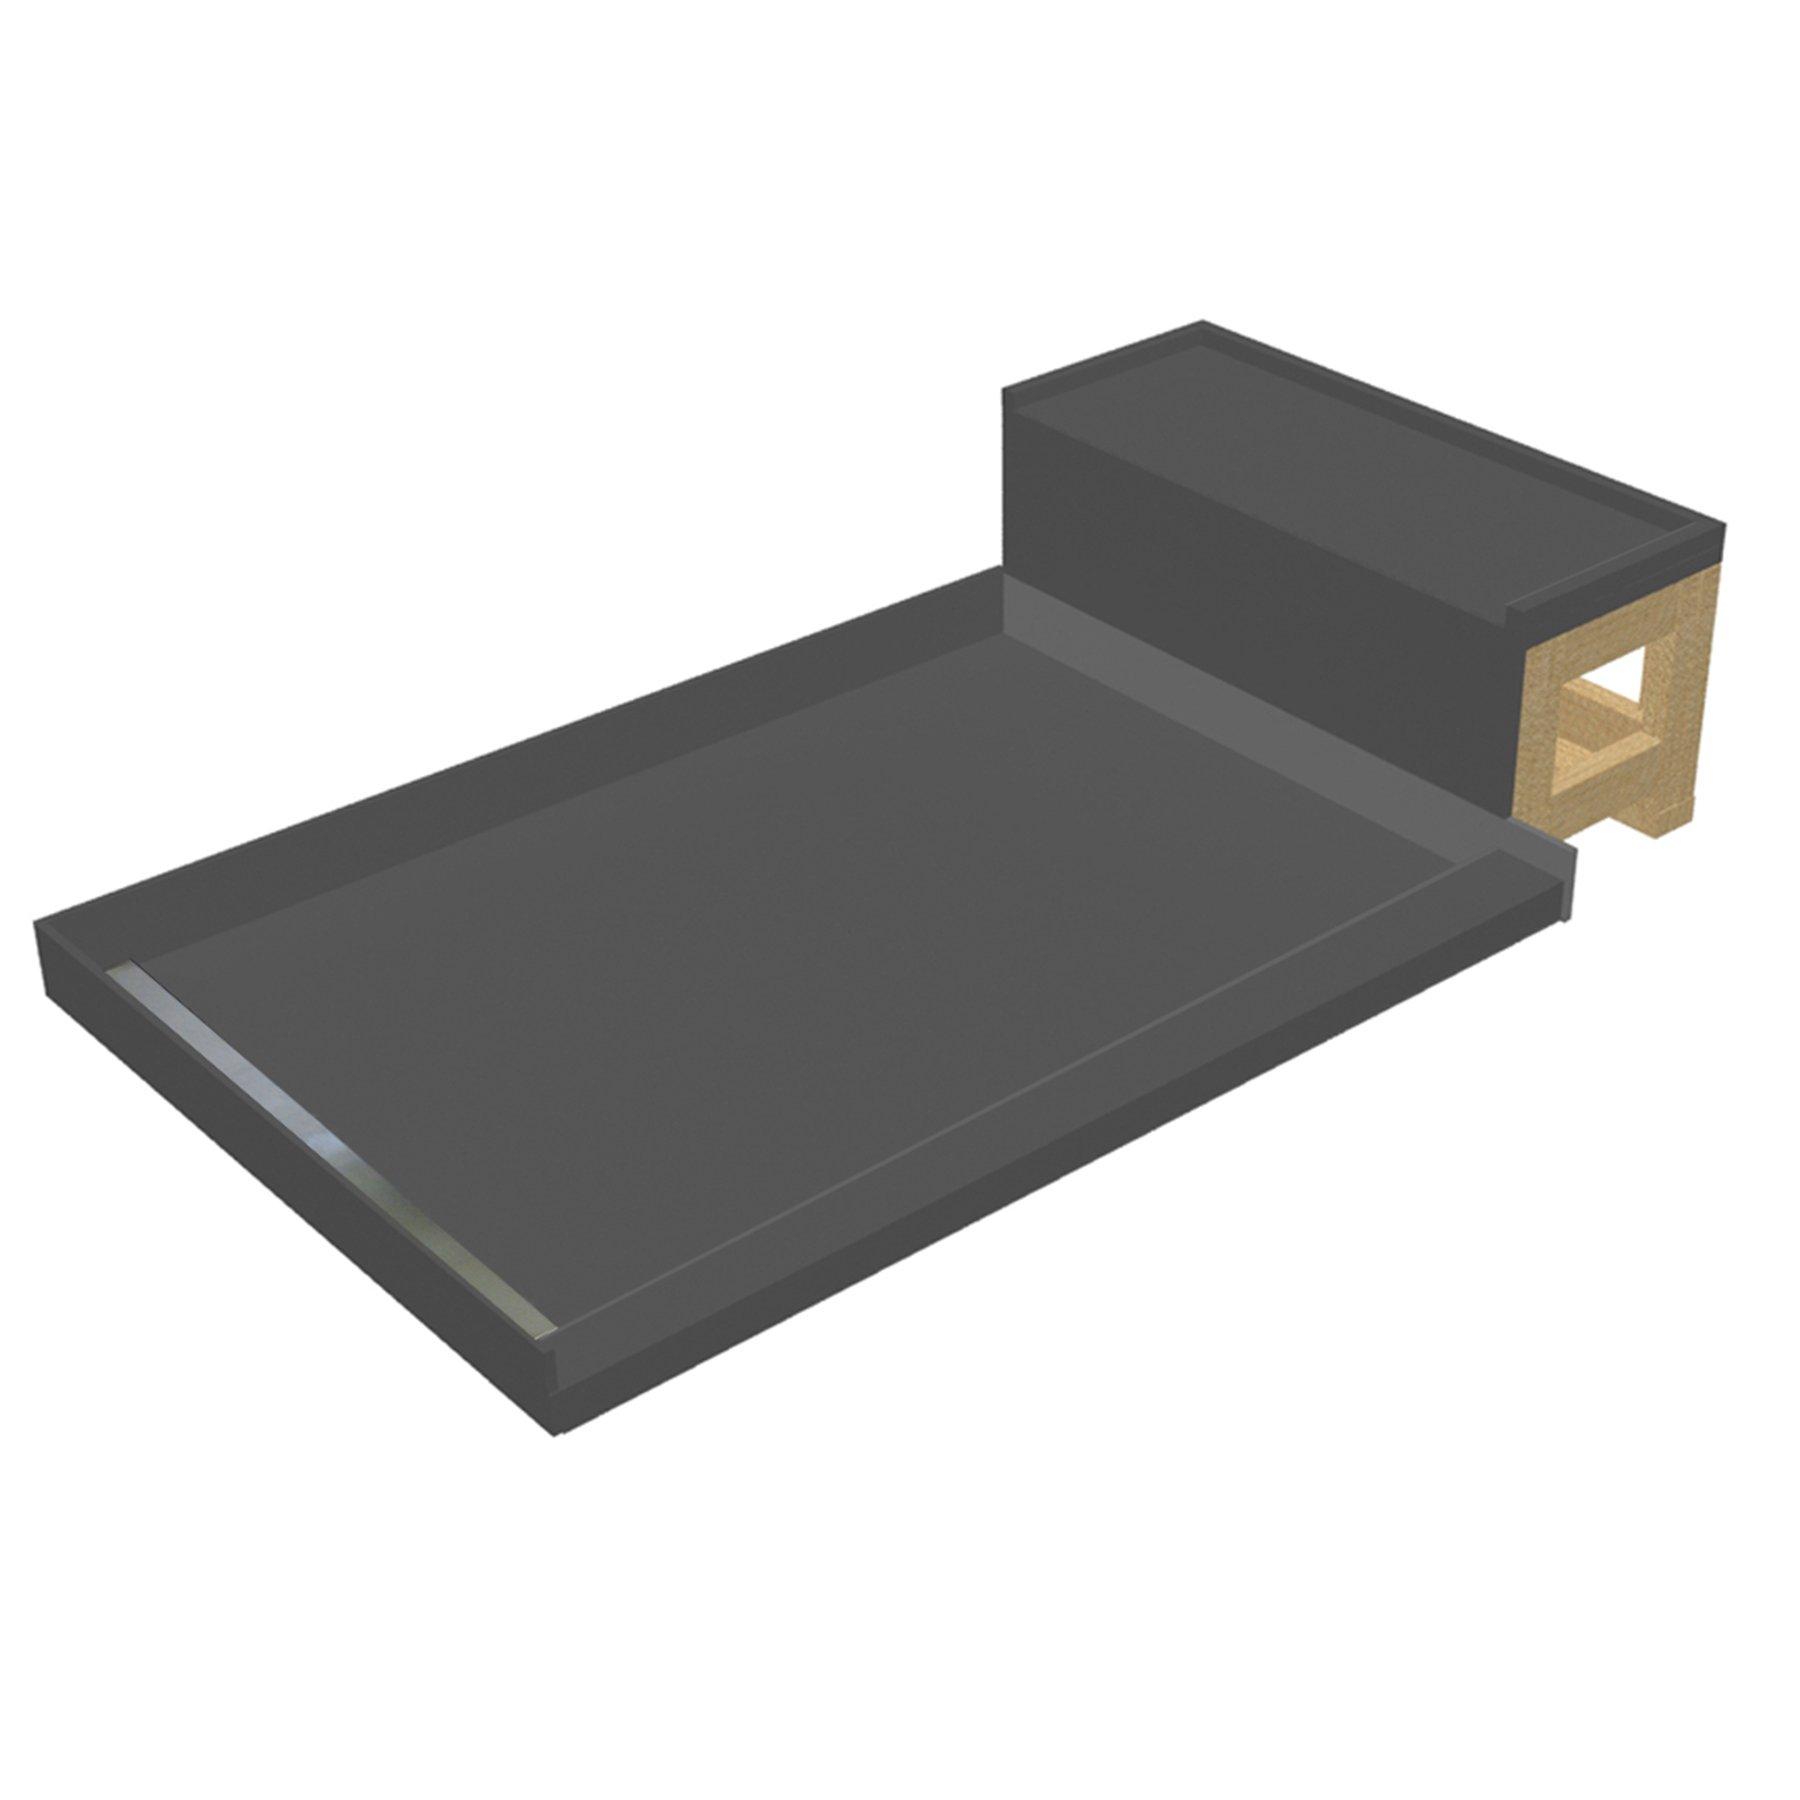 Tile Redi USA WF3260L-RB32-KIT-2.5 Base'N Bench Shower Pan